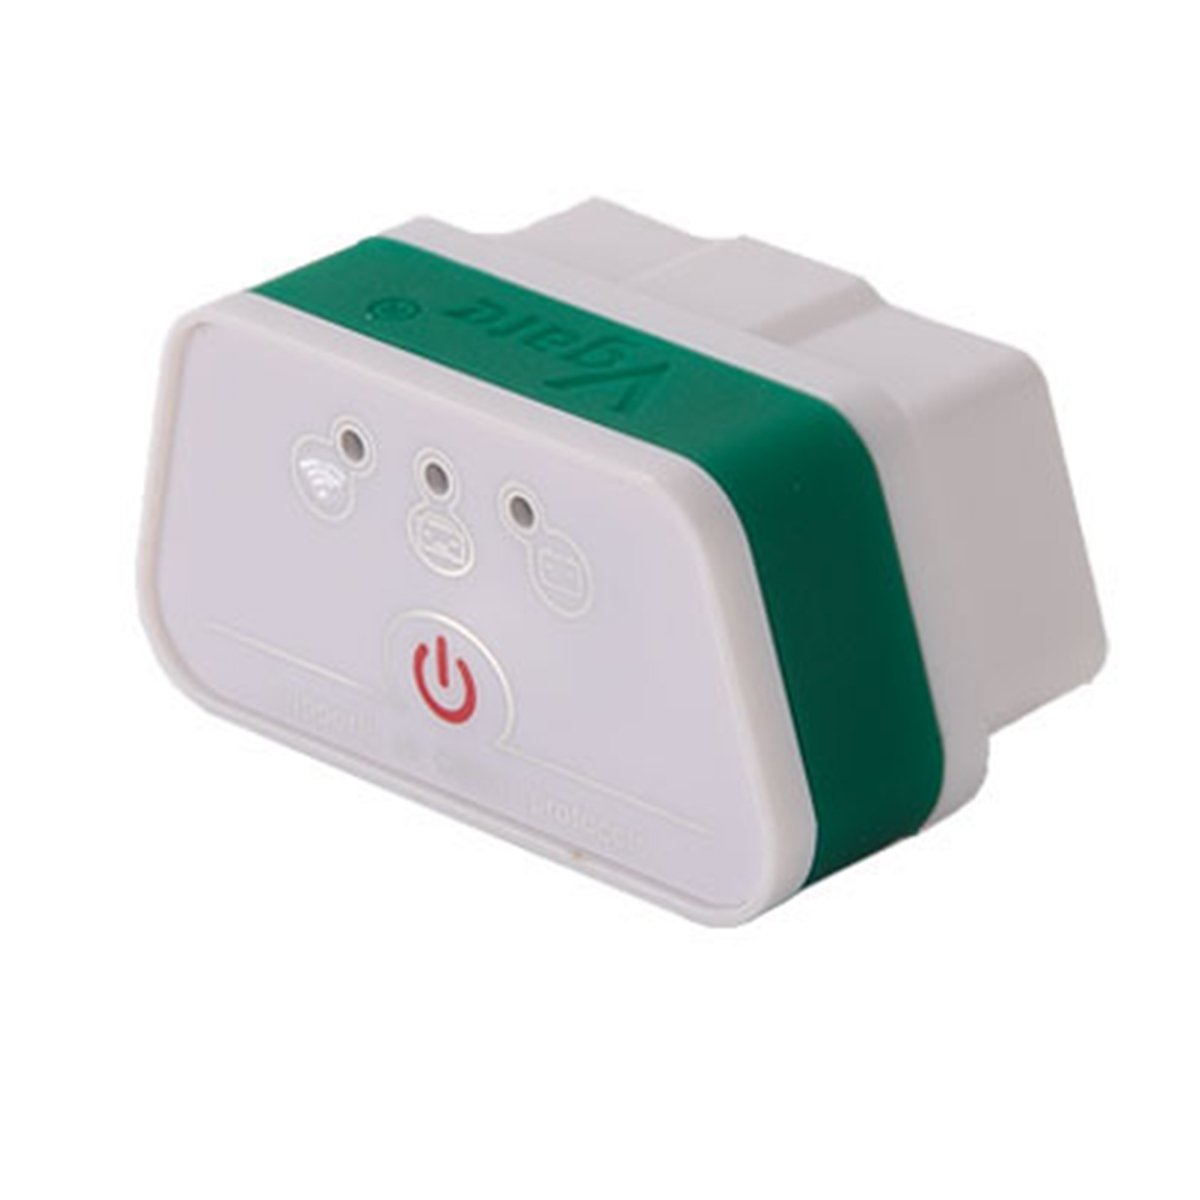 IDS Home ELM327 Wi-Fi OBD2 Car Diagnosis - White + Green